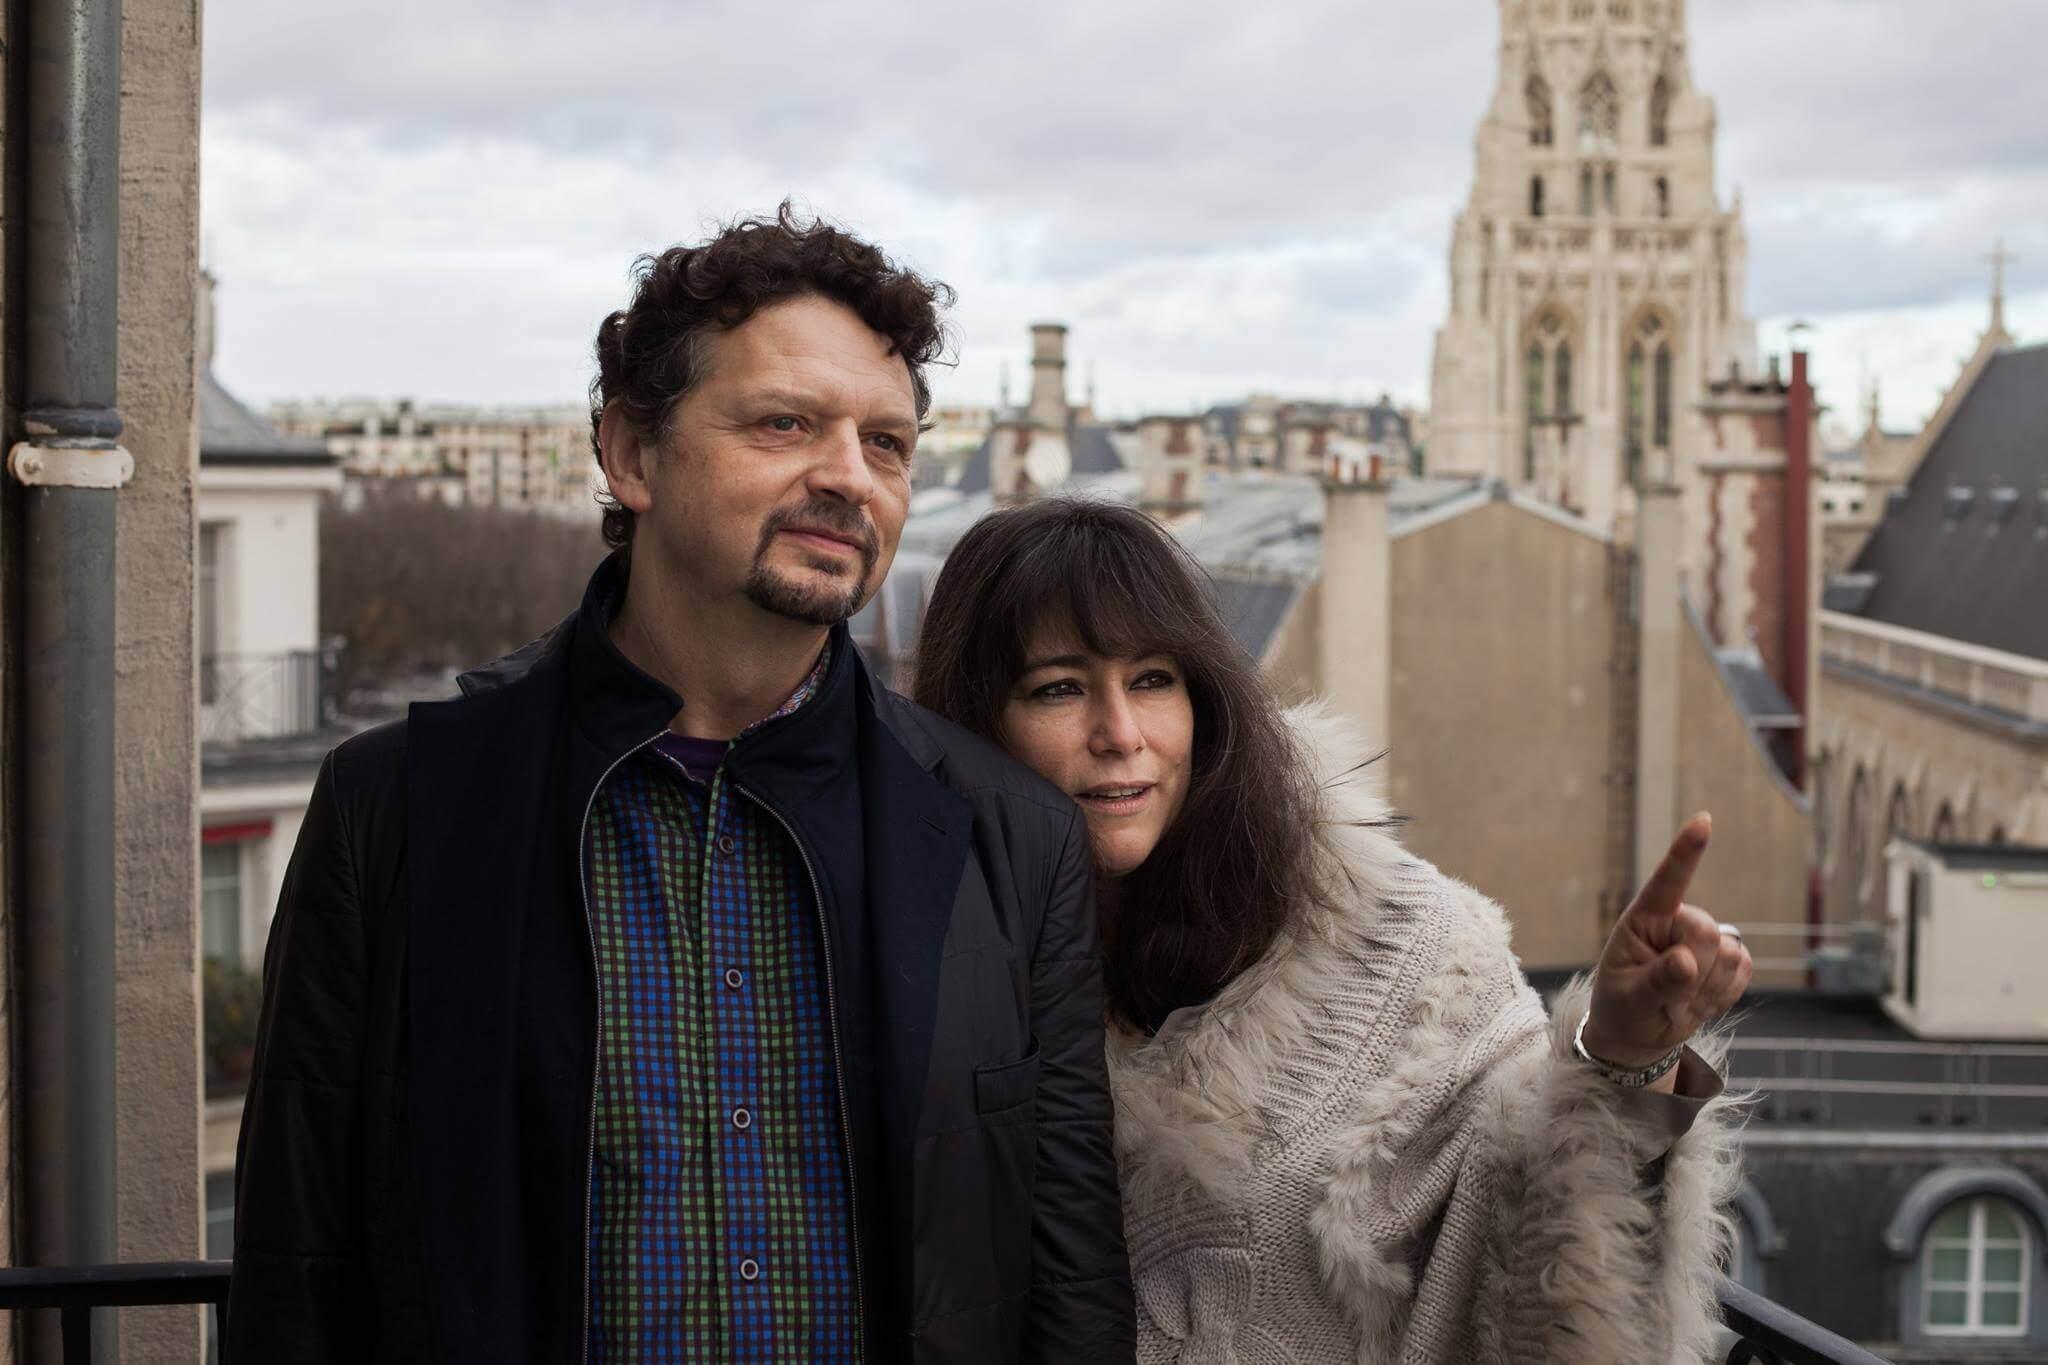 Marco Frediani et Lourdes Gutierrez